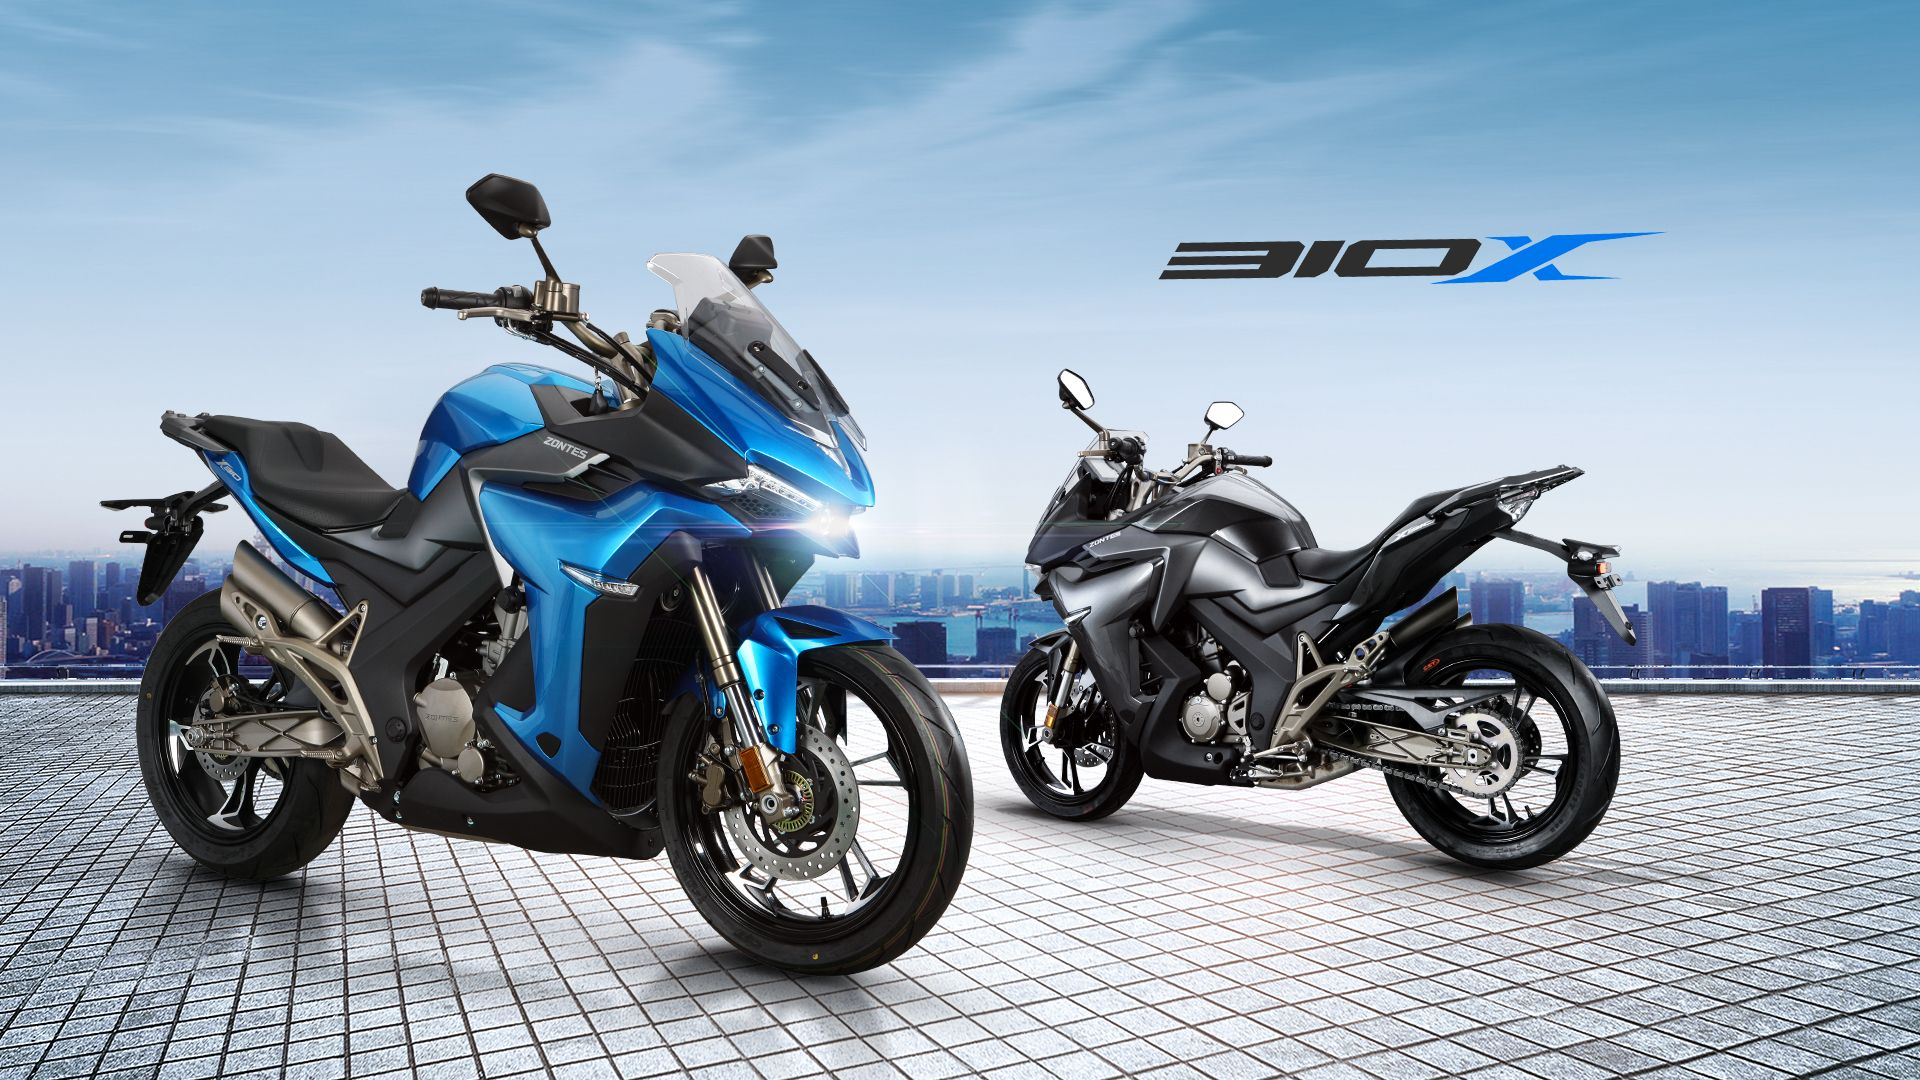 Zontes 310x Fuel Efficient Electric Motorcycle Sport Bikes